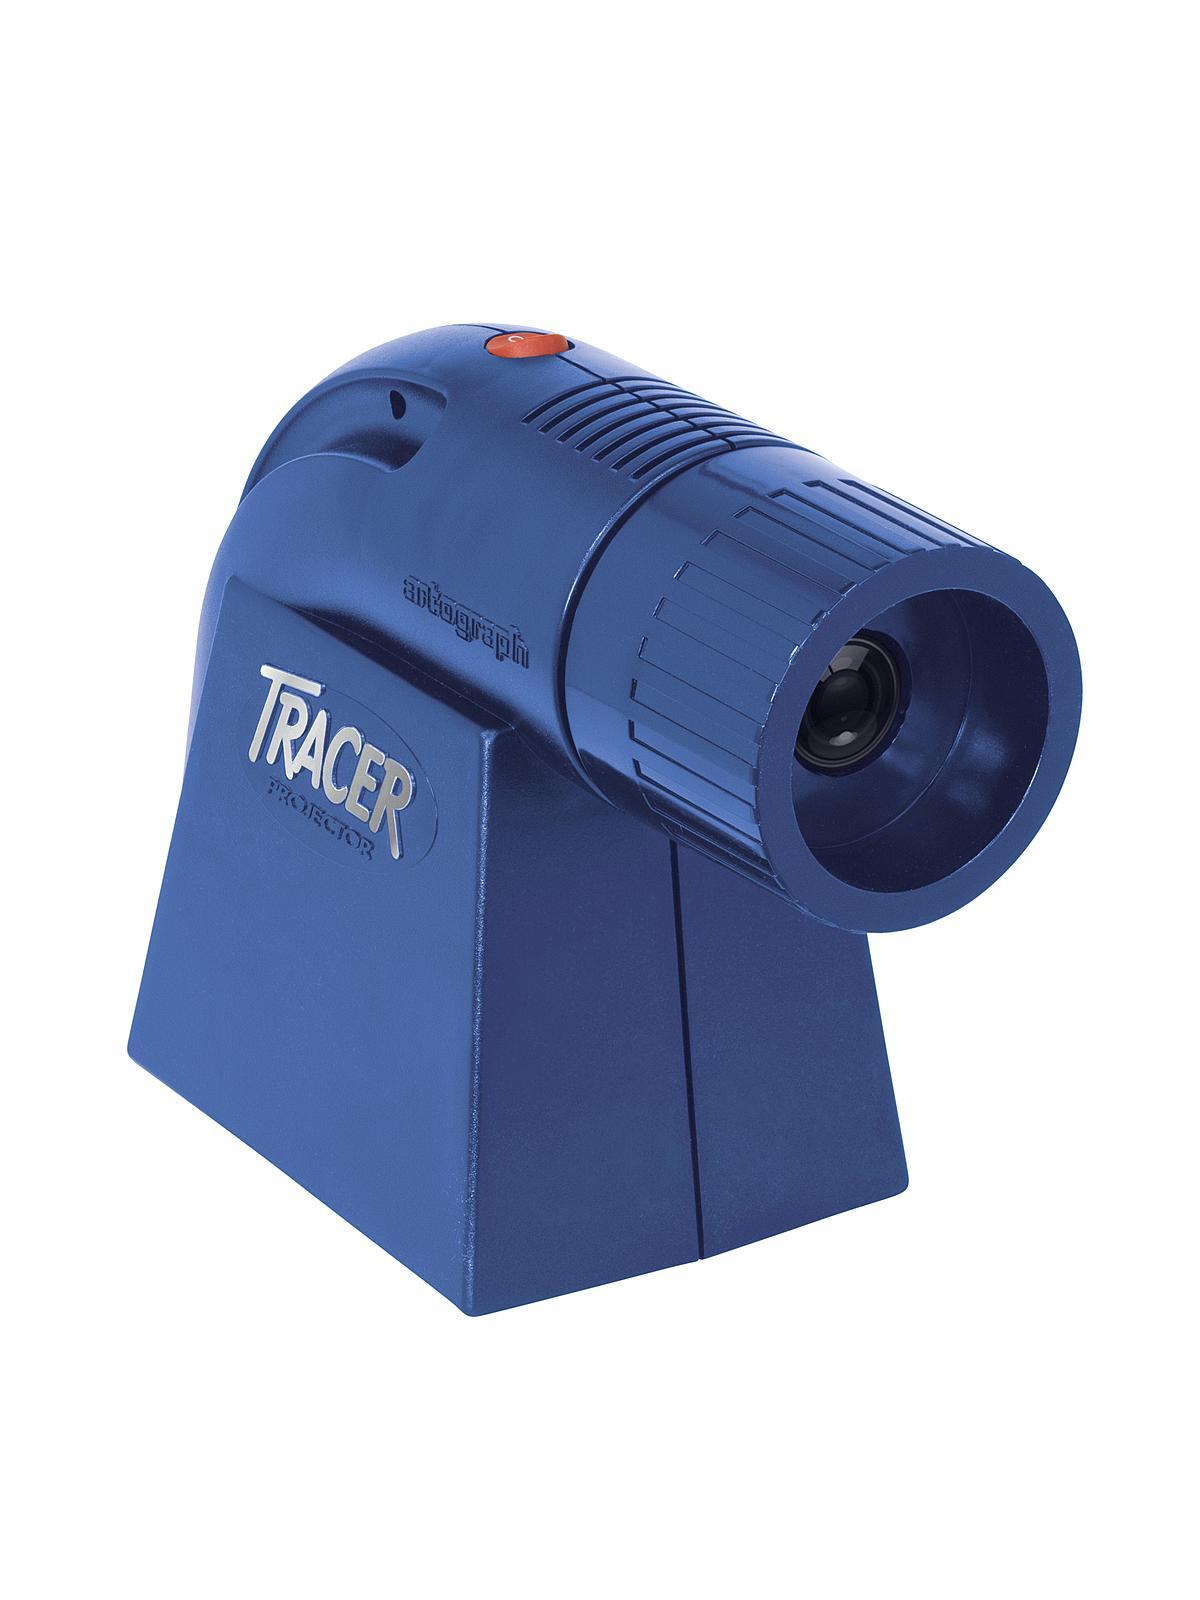 Artograph Tracer Projector | MisterArt.com